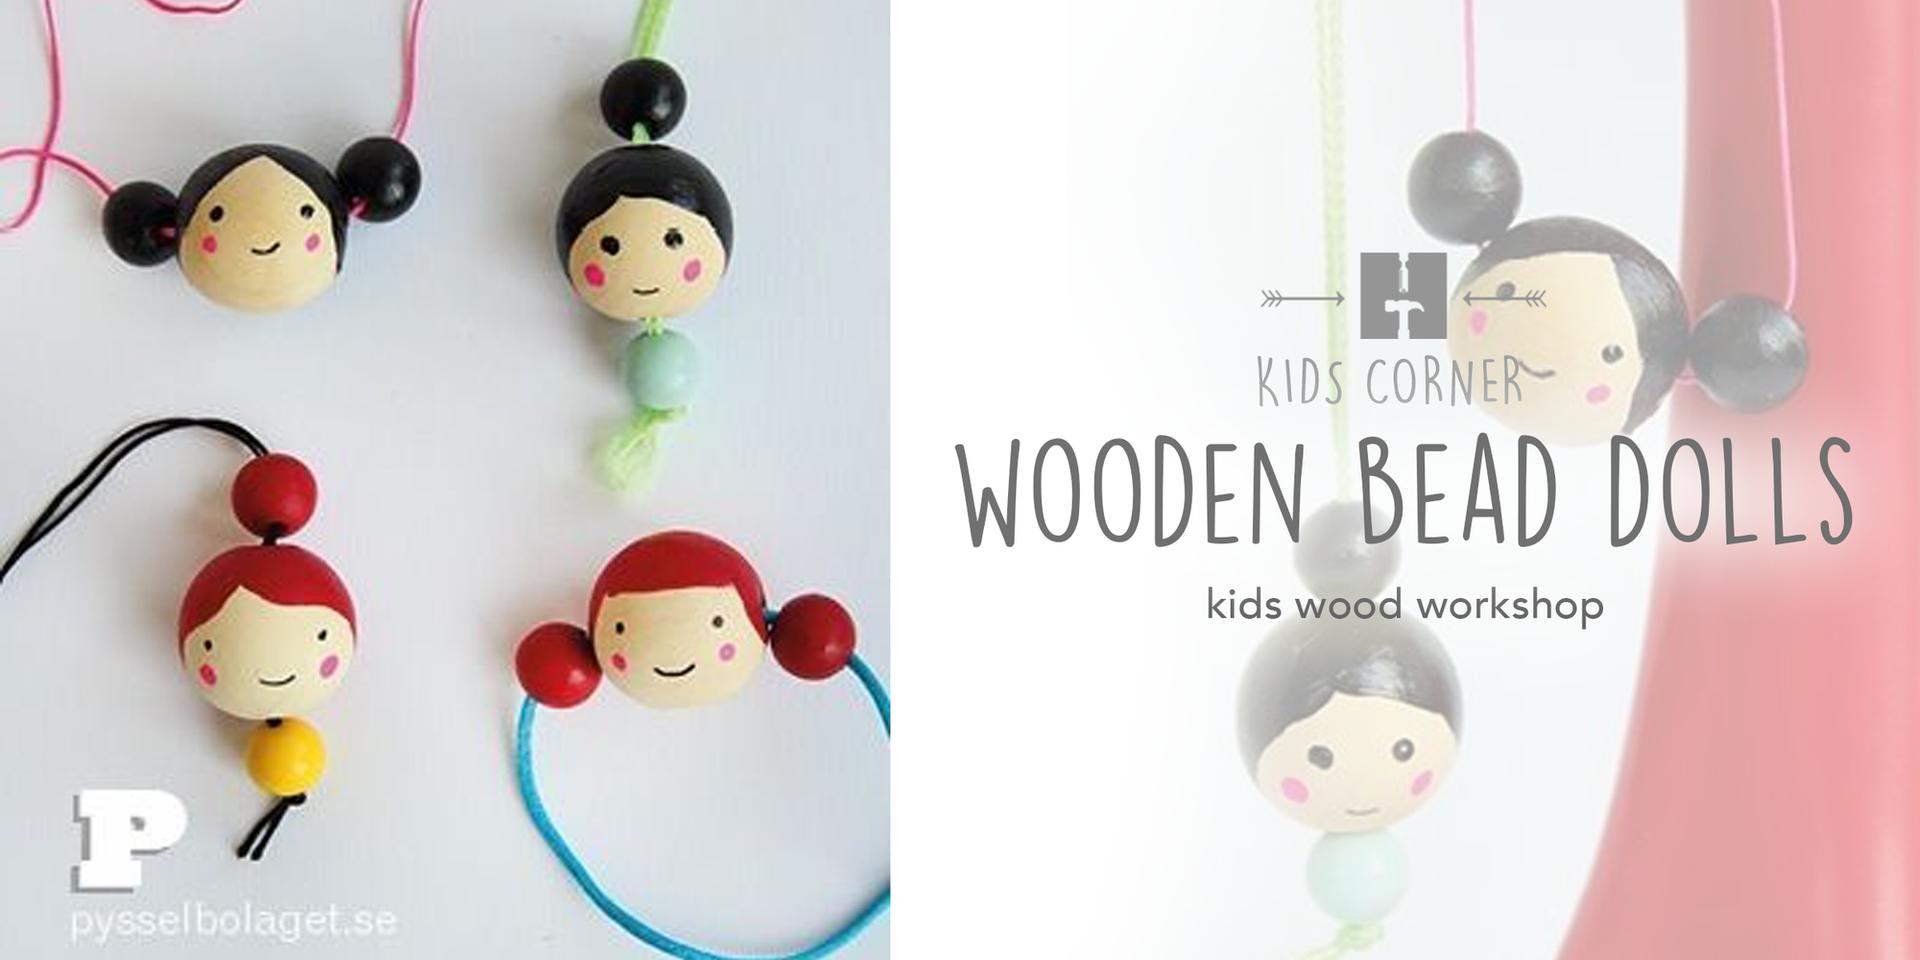 Wooden Bead Dolls